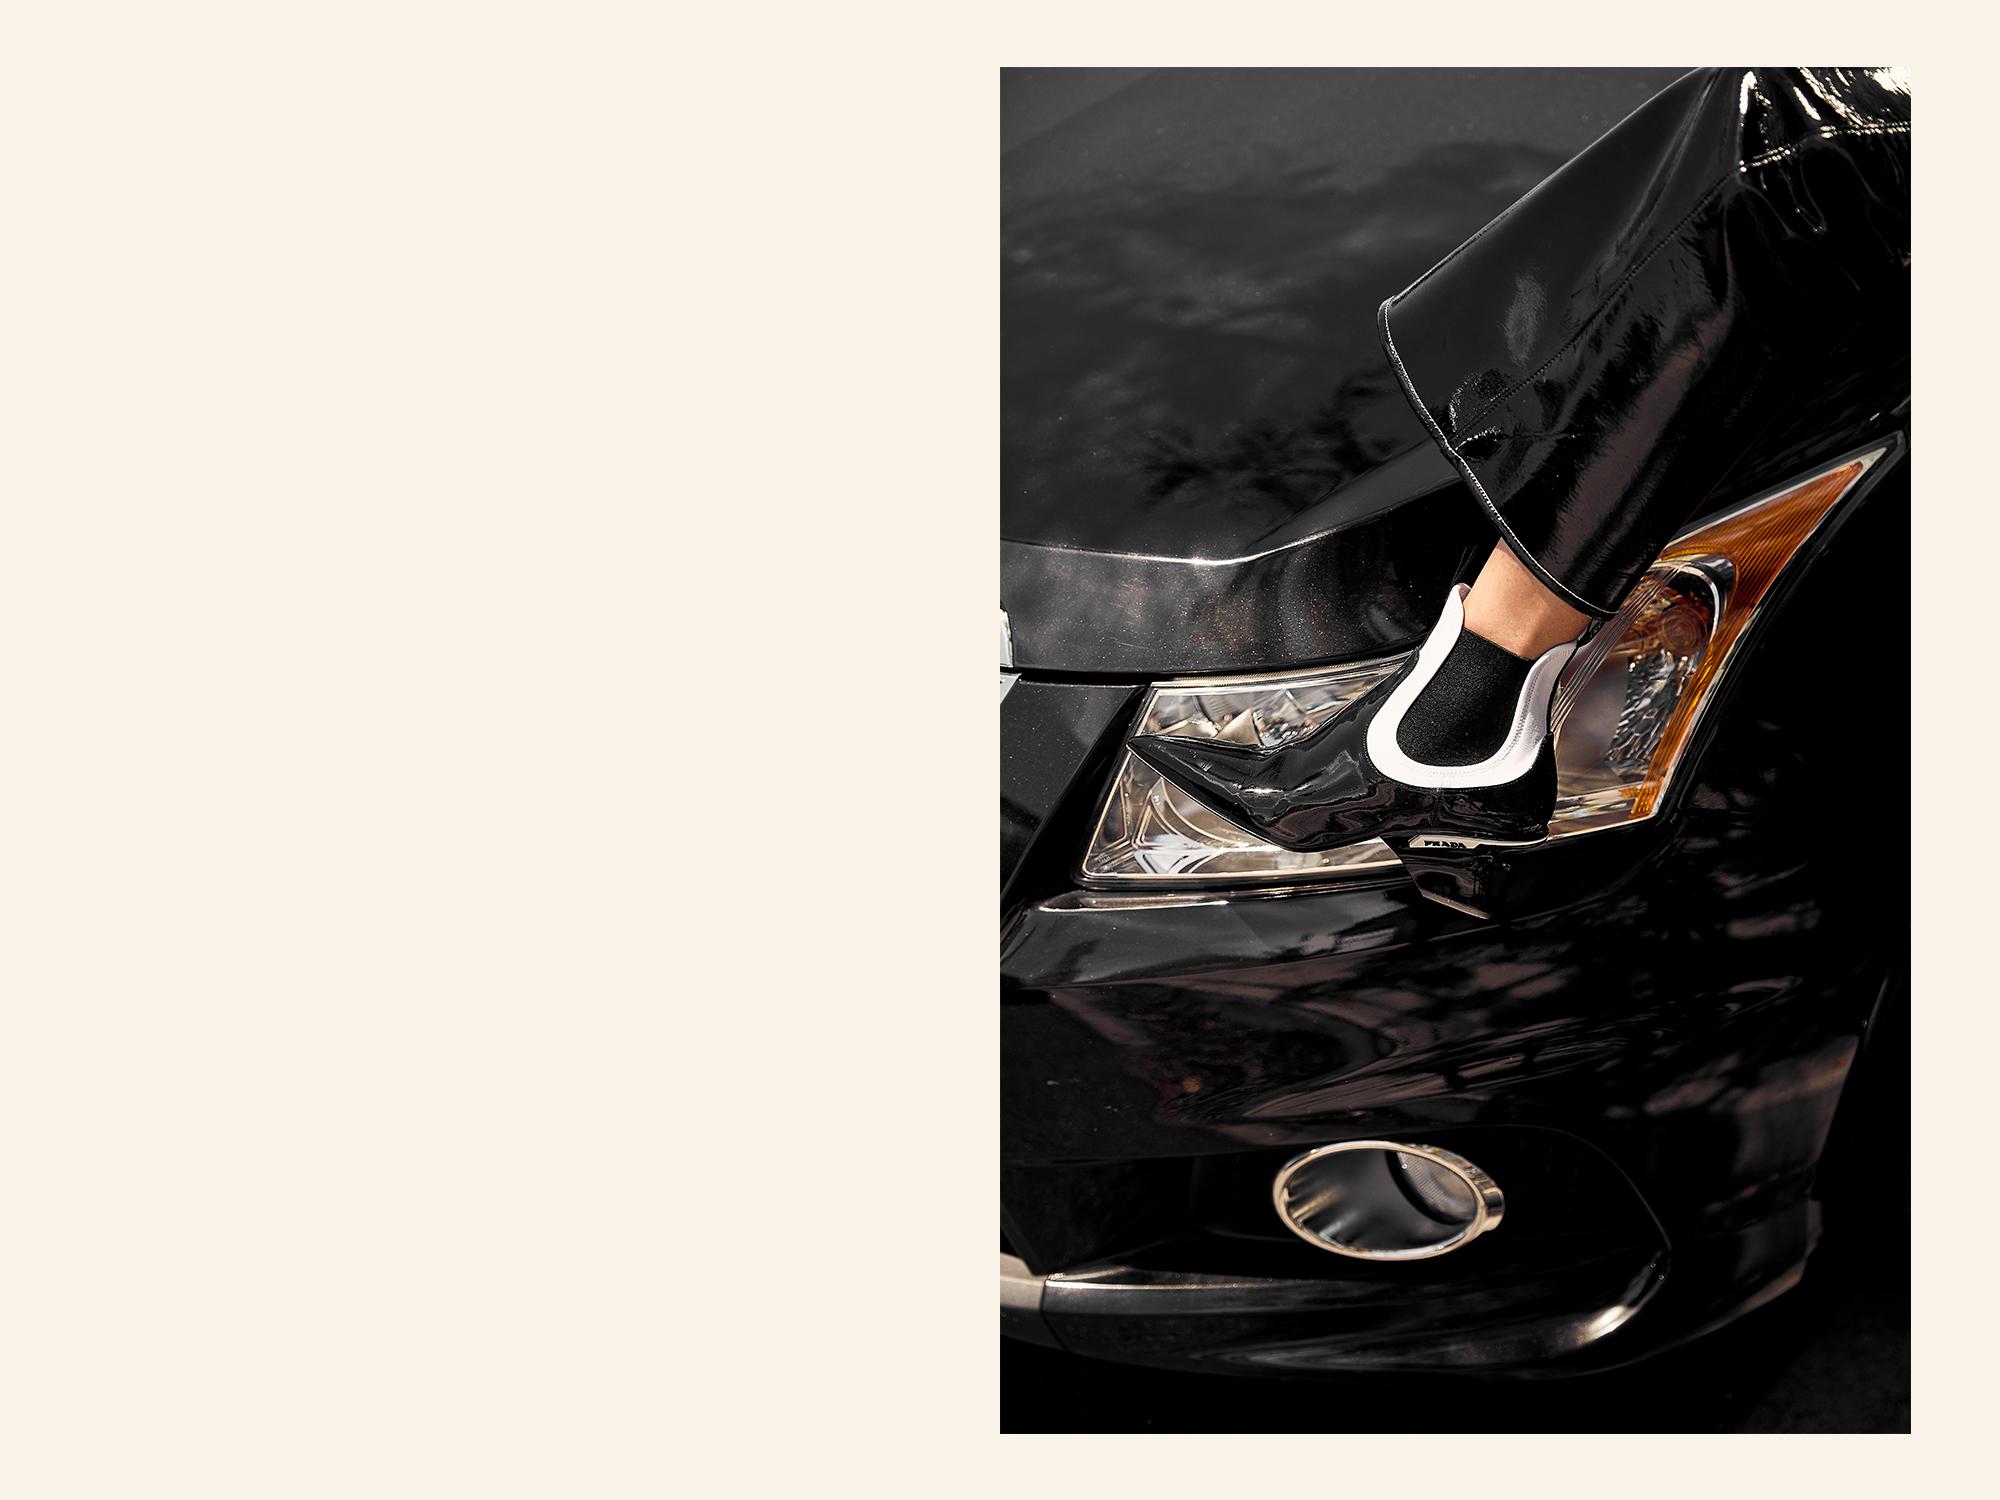 Black, Prada, Boots, Balenciaga, Crystal Earrings, Editors Outfit, Oracle, Fox